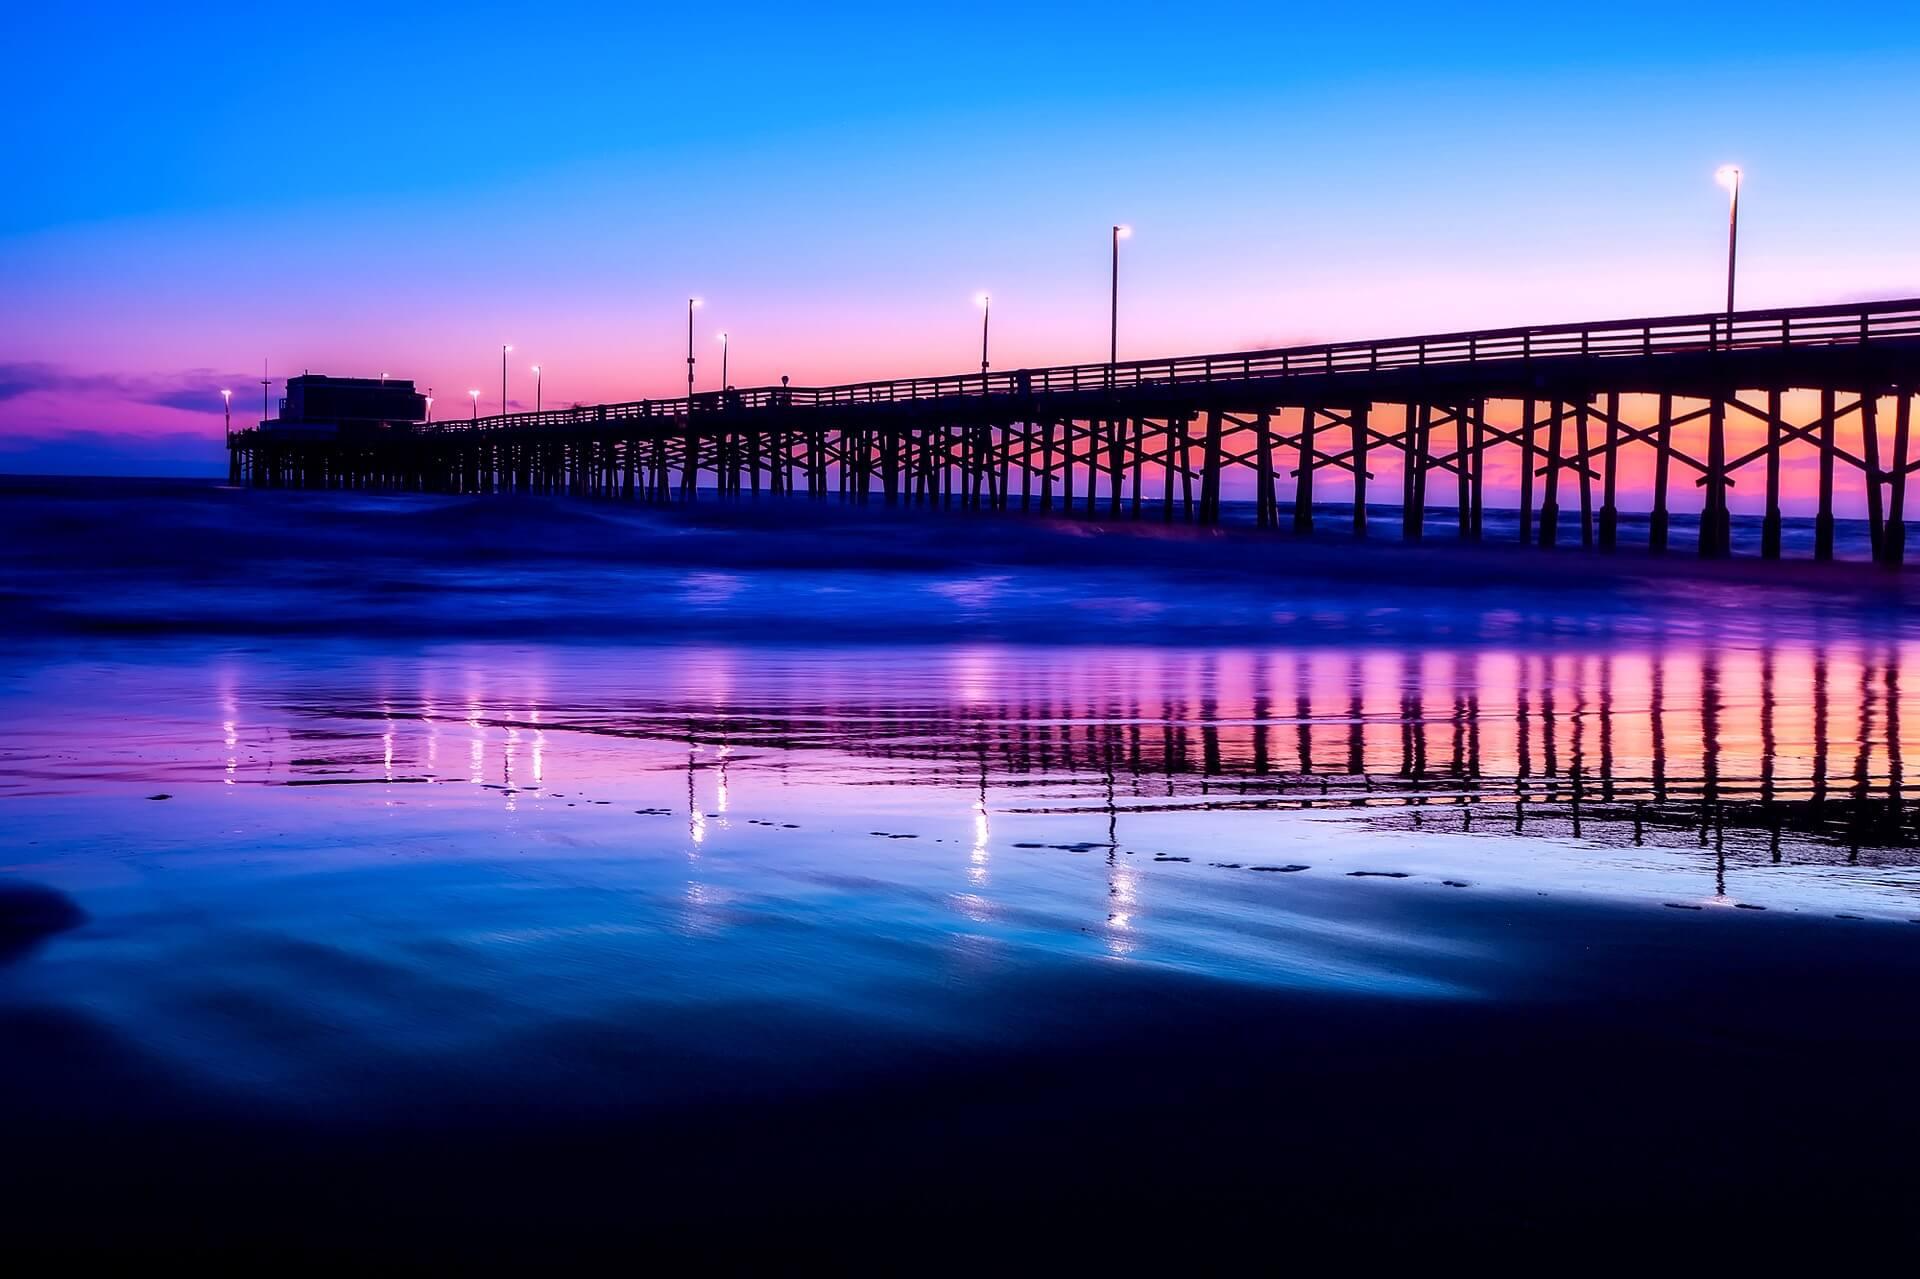 Newport Beach, Orange County, CA